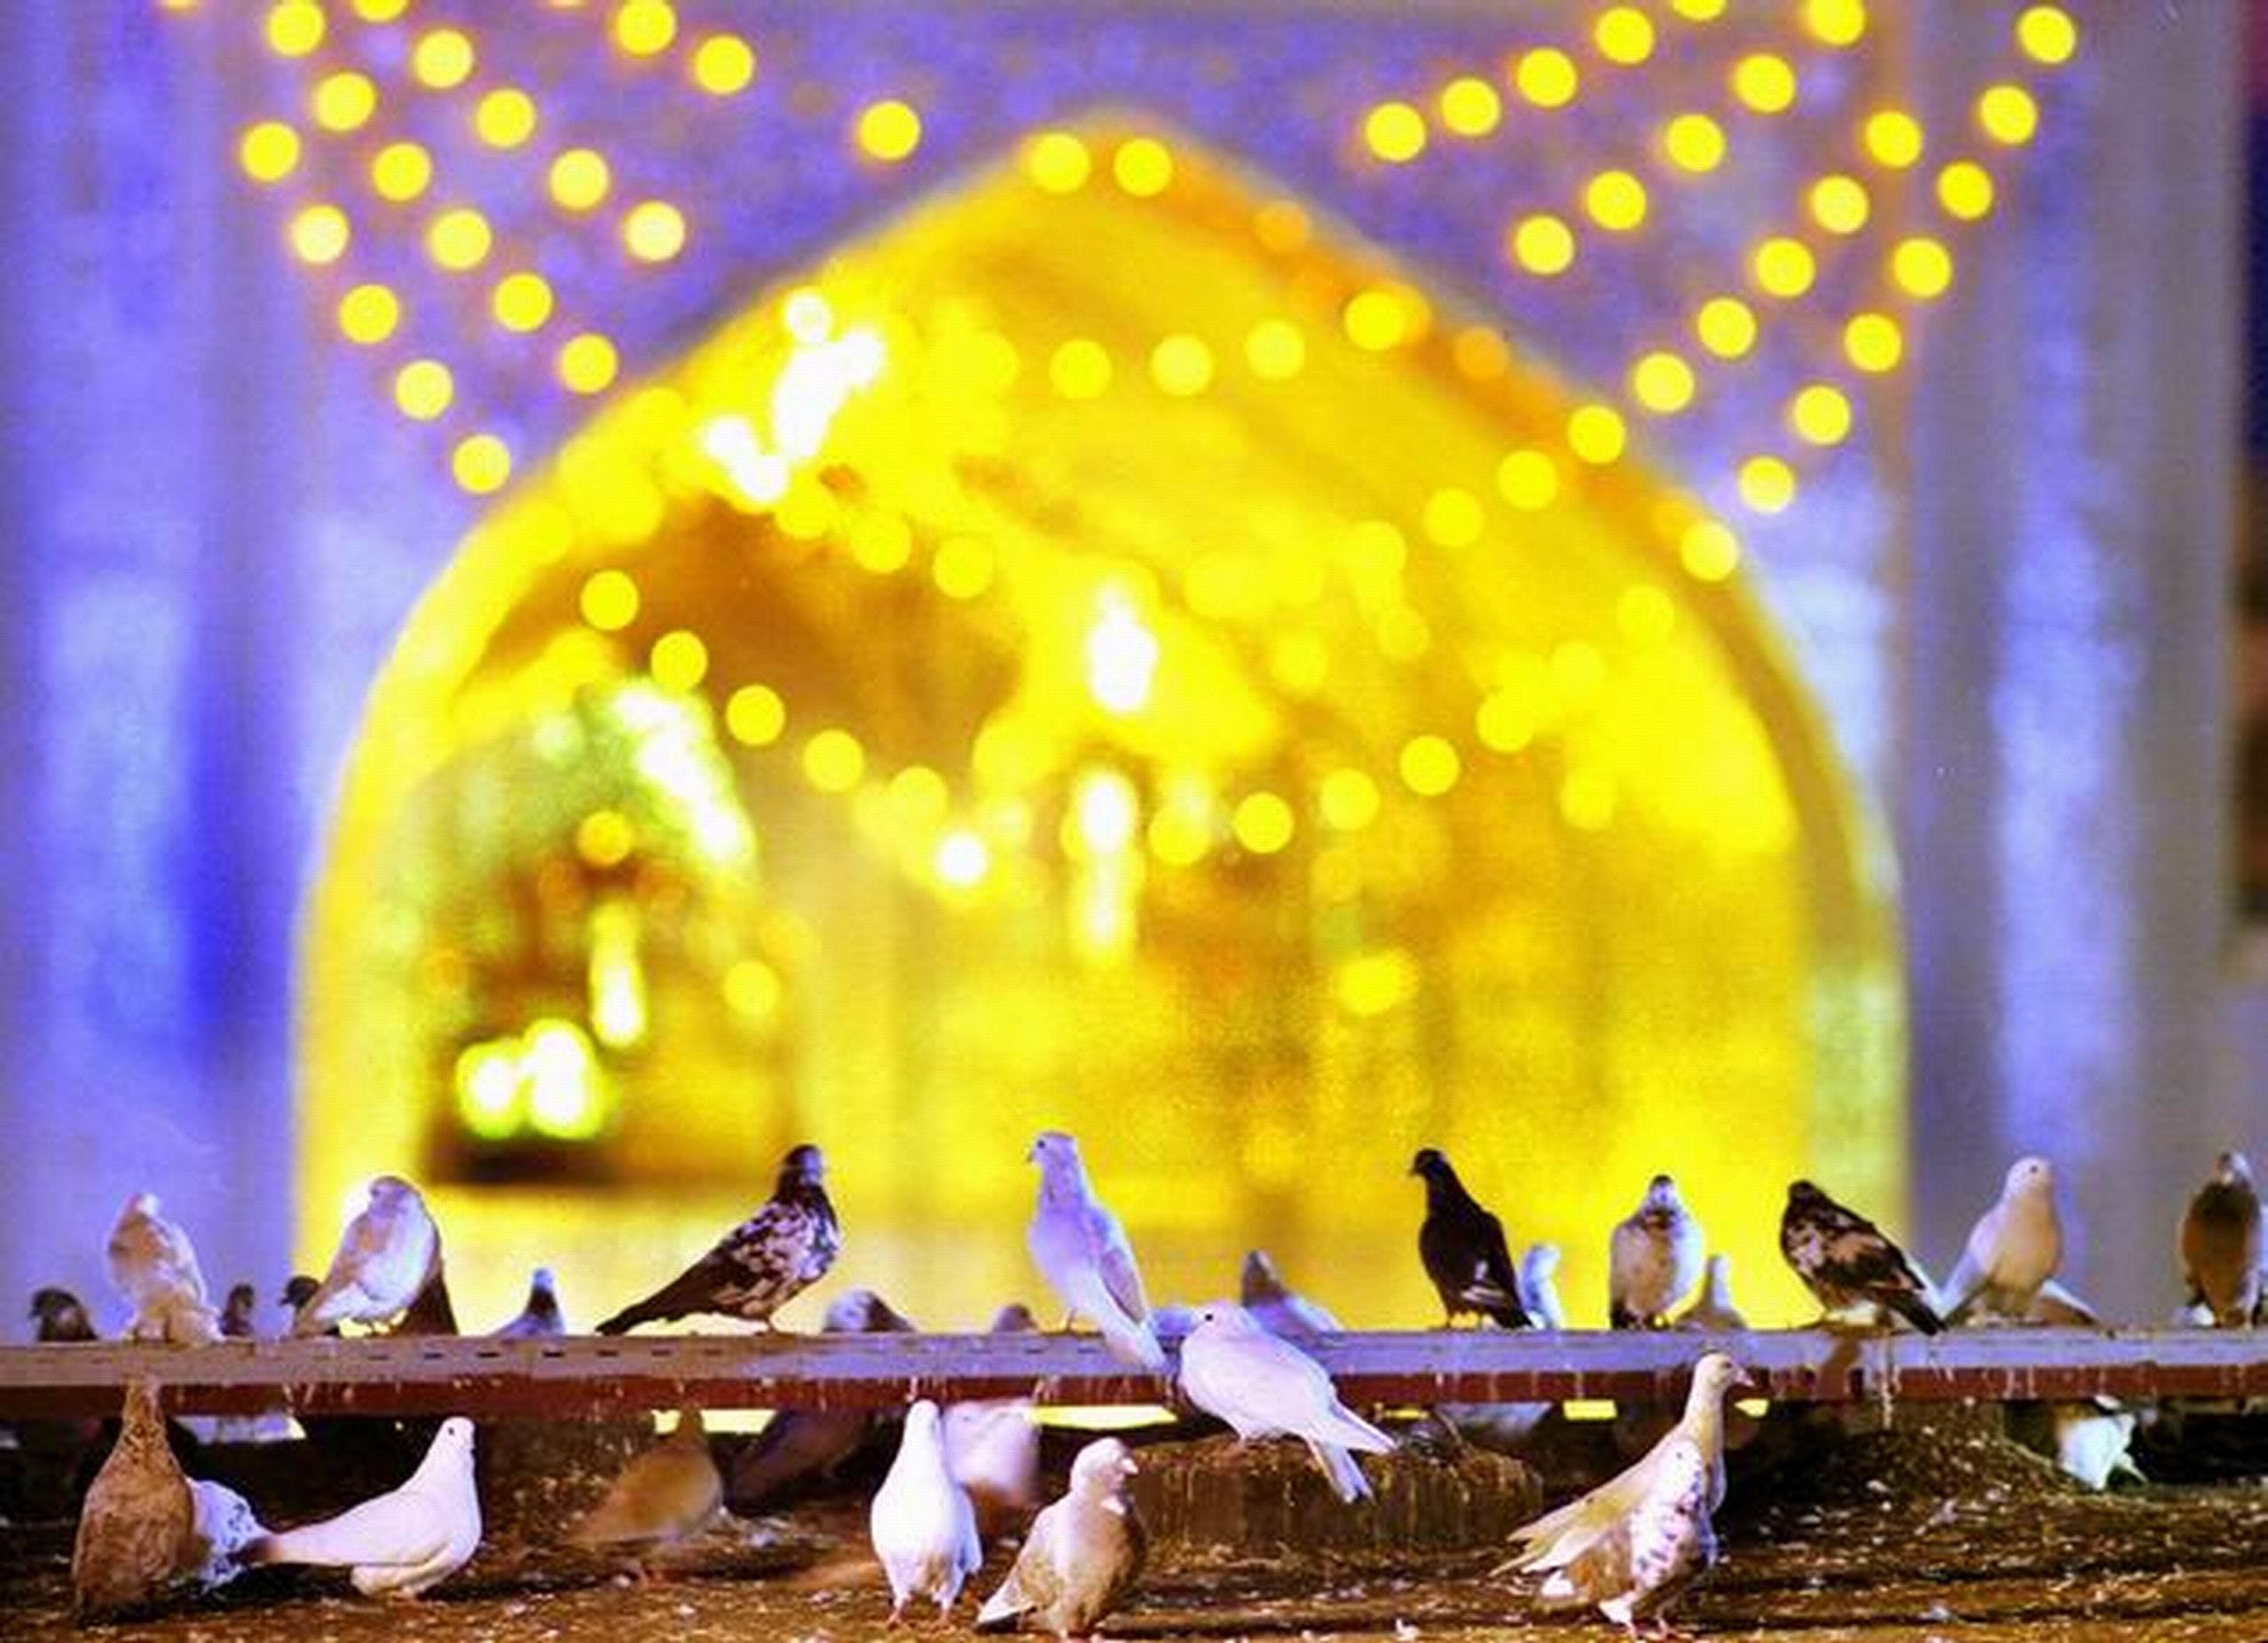 Free stock photo of Iran - Mashhad 2003